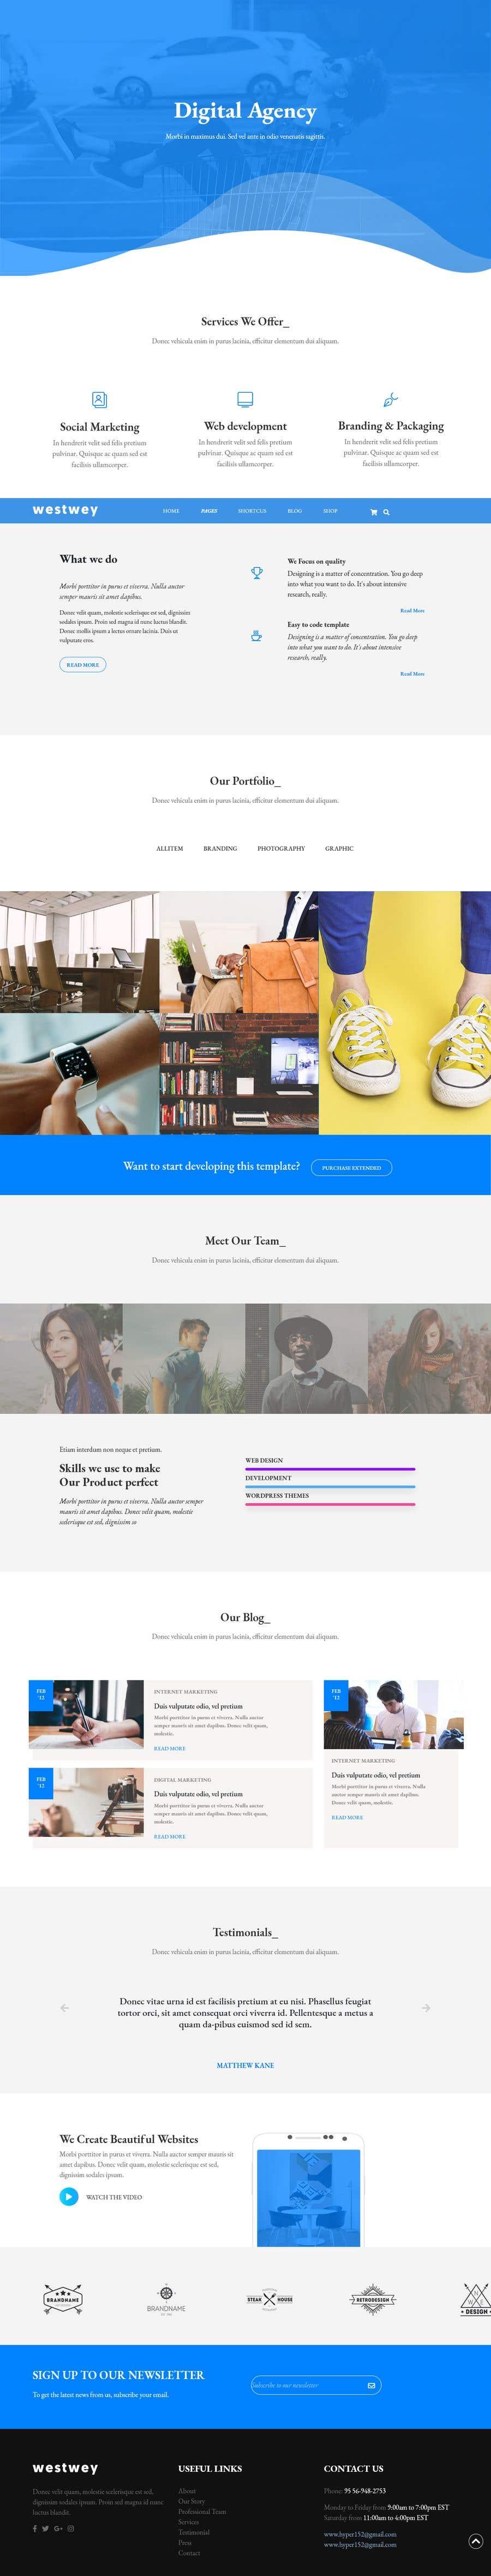 Bài tham dự cuộc thi #                                        2                                      cho                                         Create a single page design for an existing site